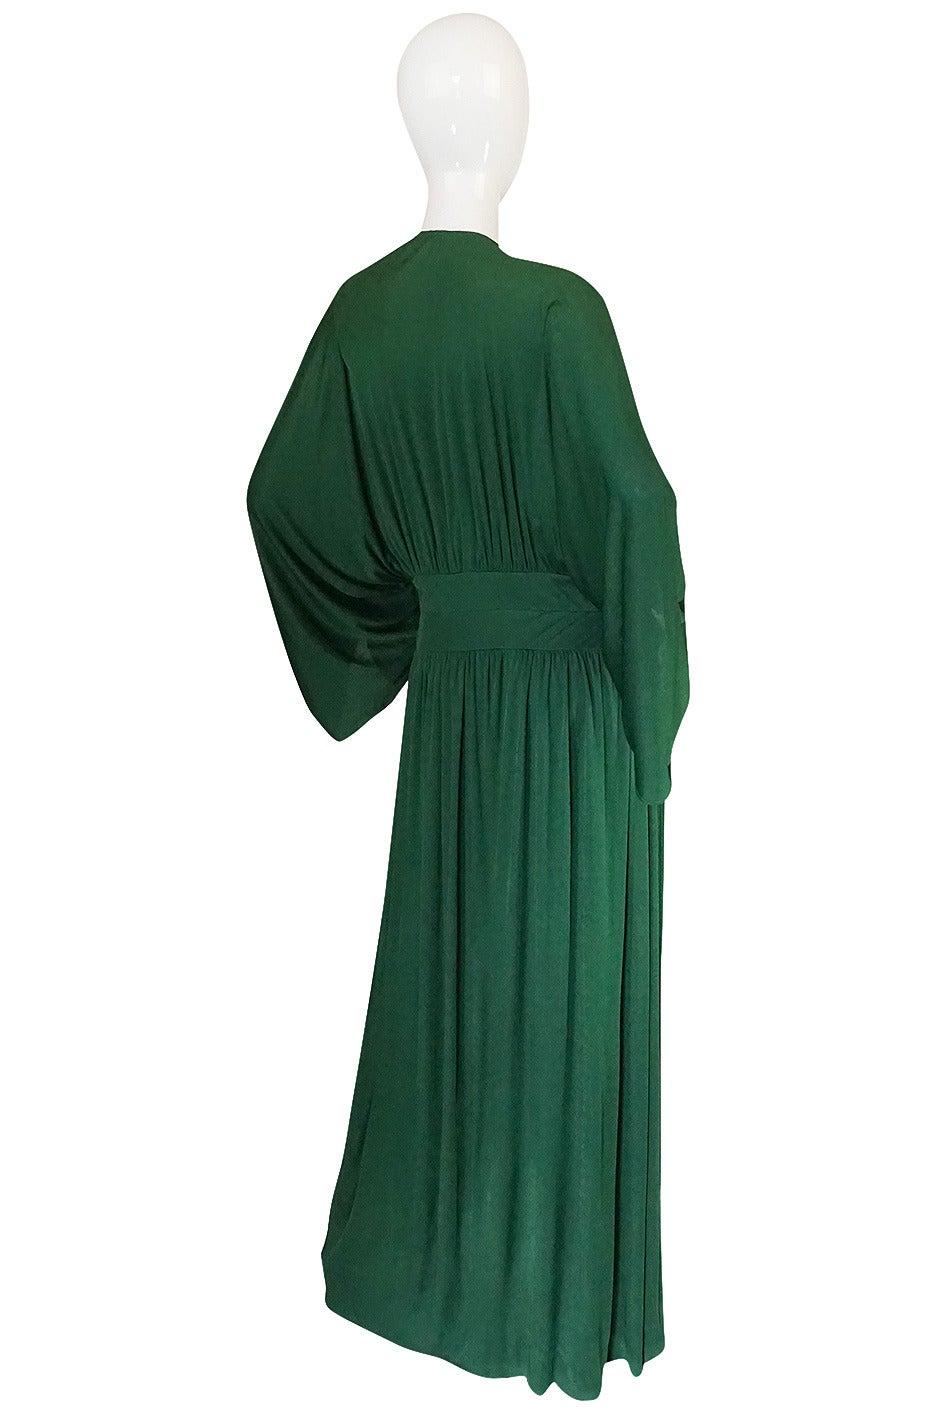 1960s Jean Patou Demi-Couture Green Jersey Caftan Dress 2